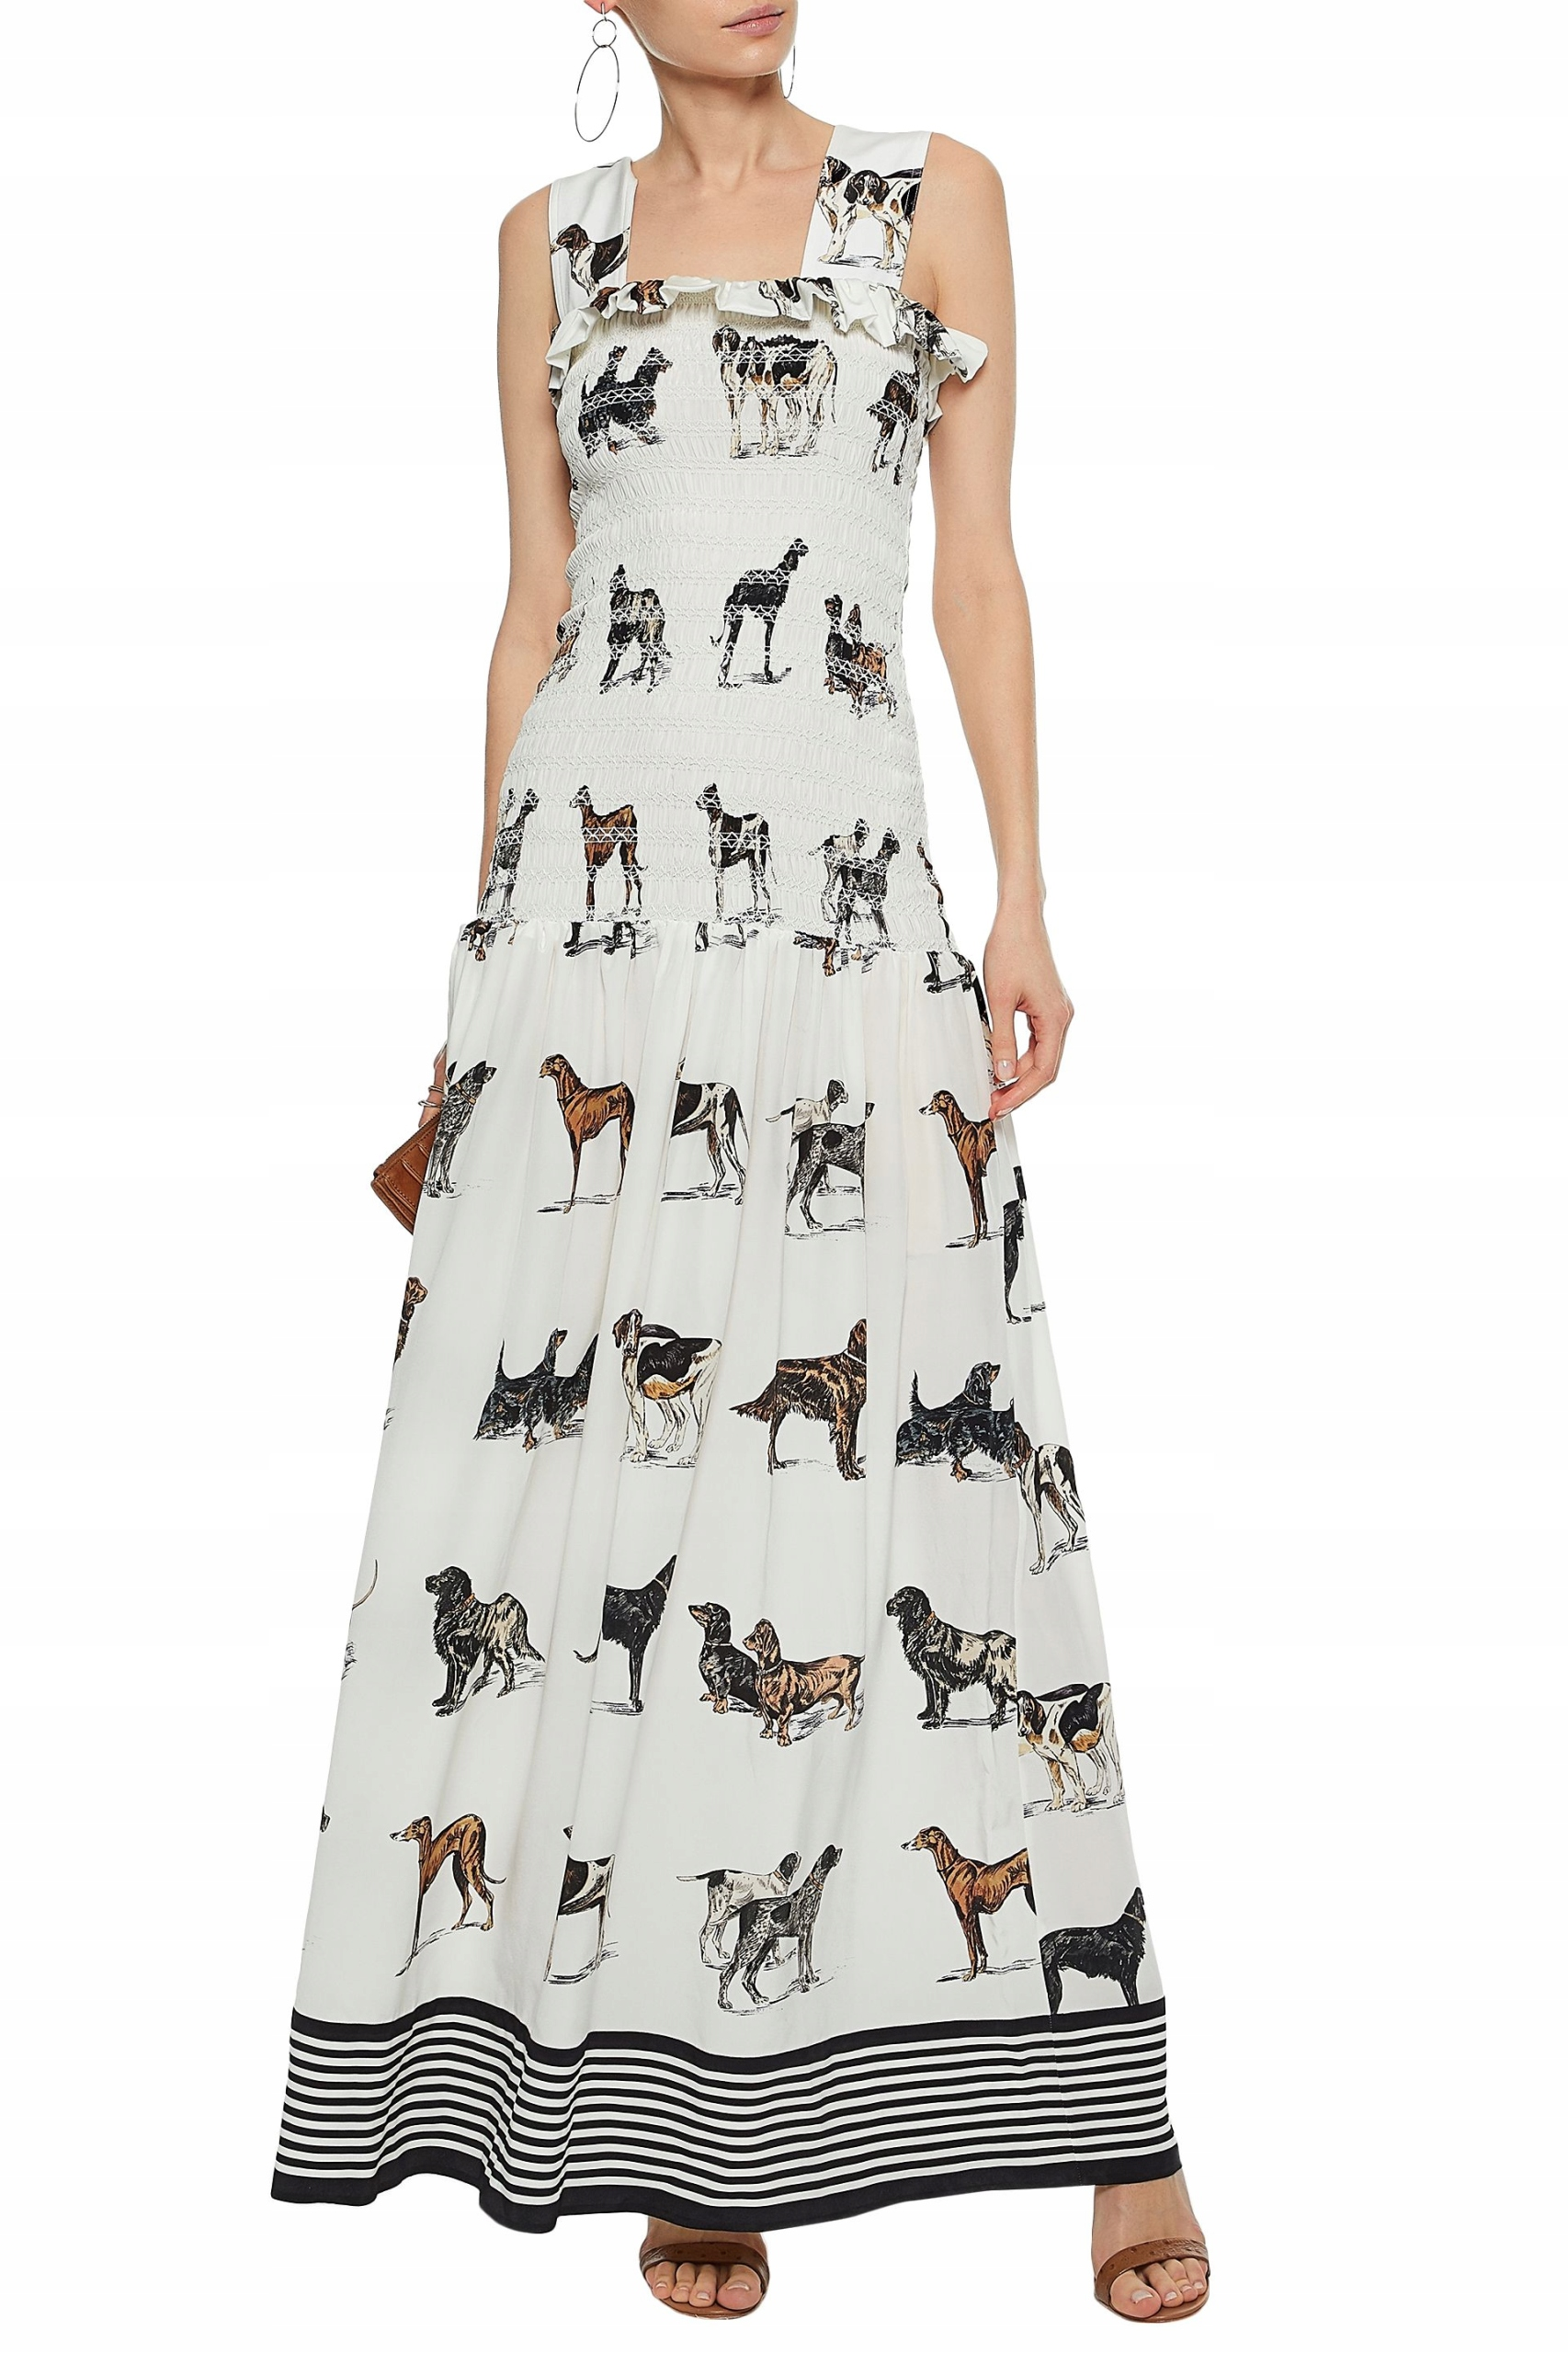 STELLA MCCARTNEY sukienka jedwab maxi nowa 34 36 - 7686620333 ... 40131a207d201